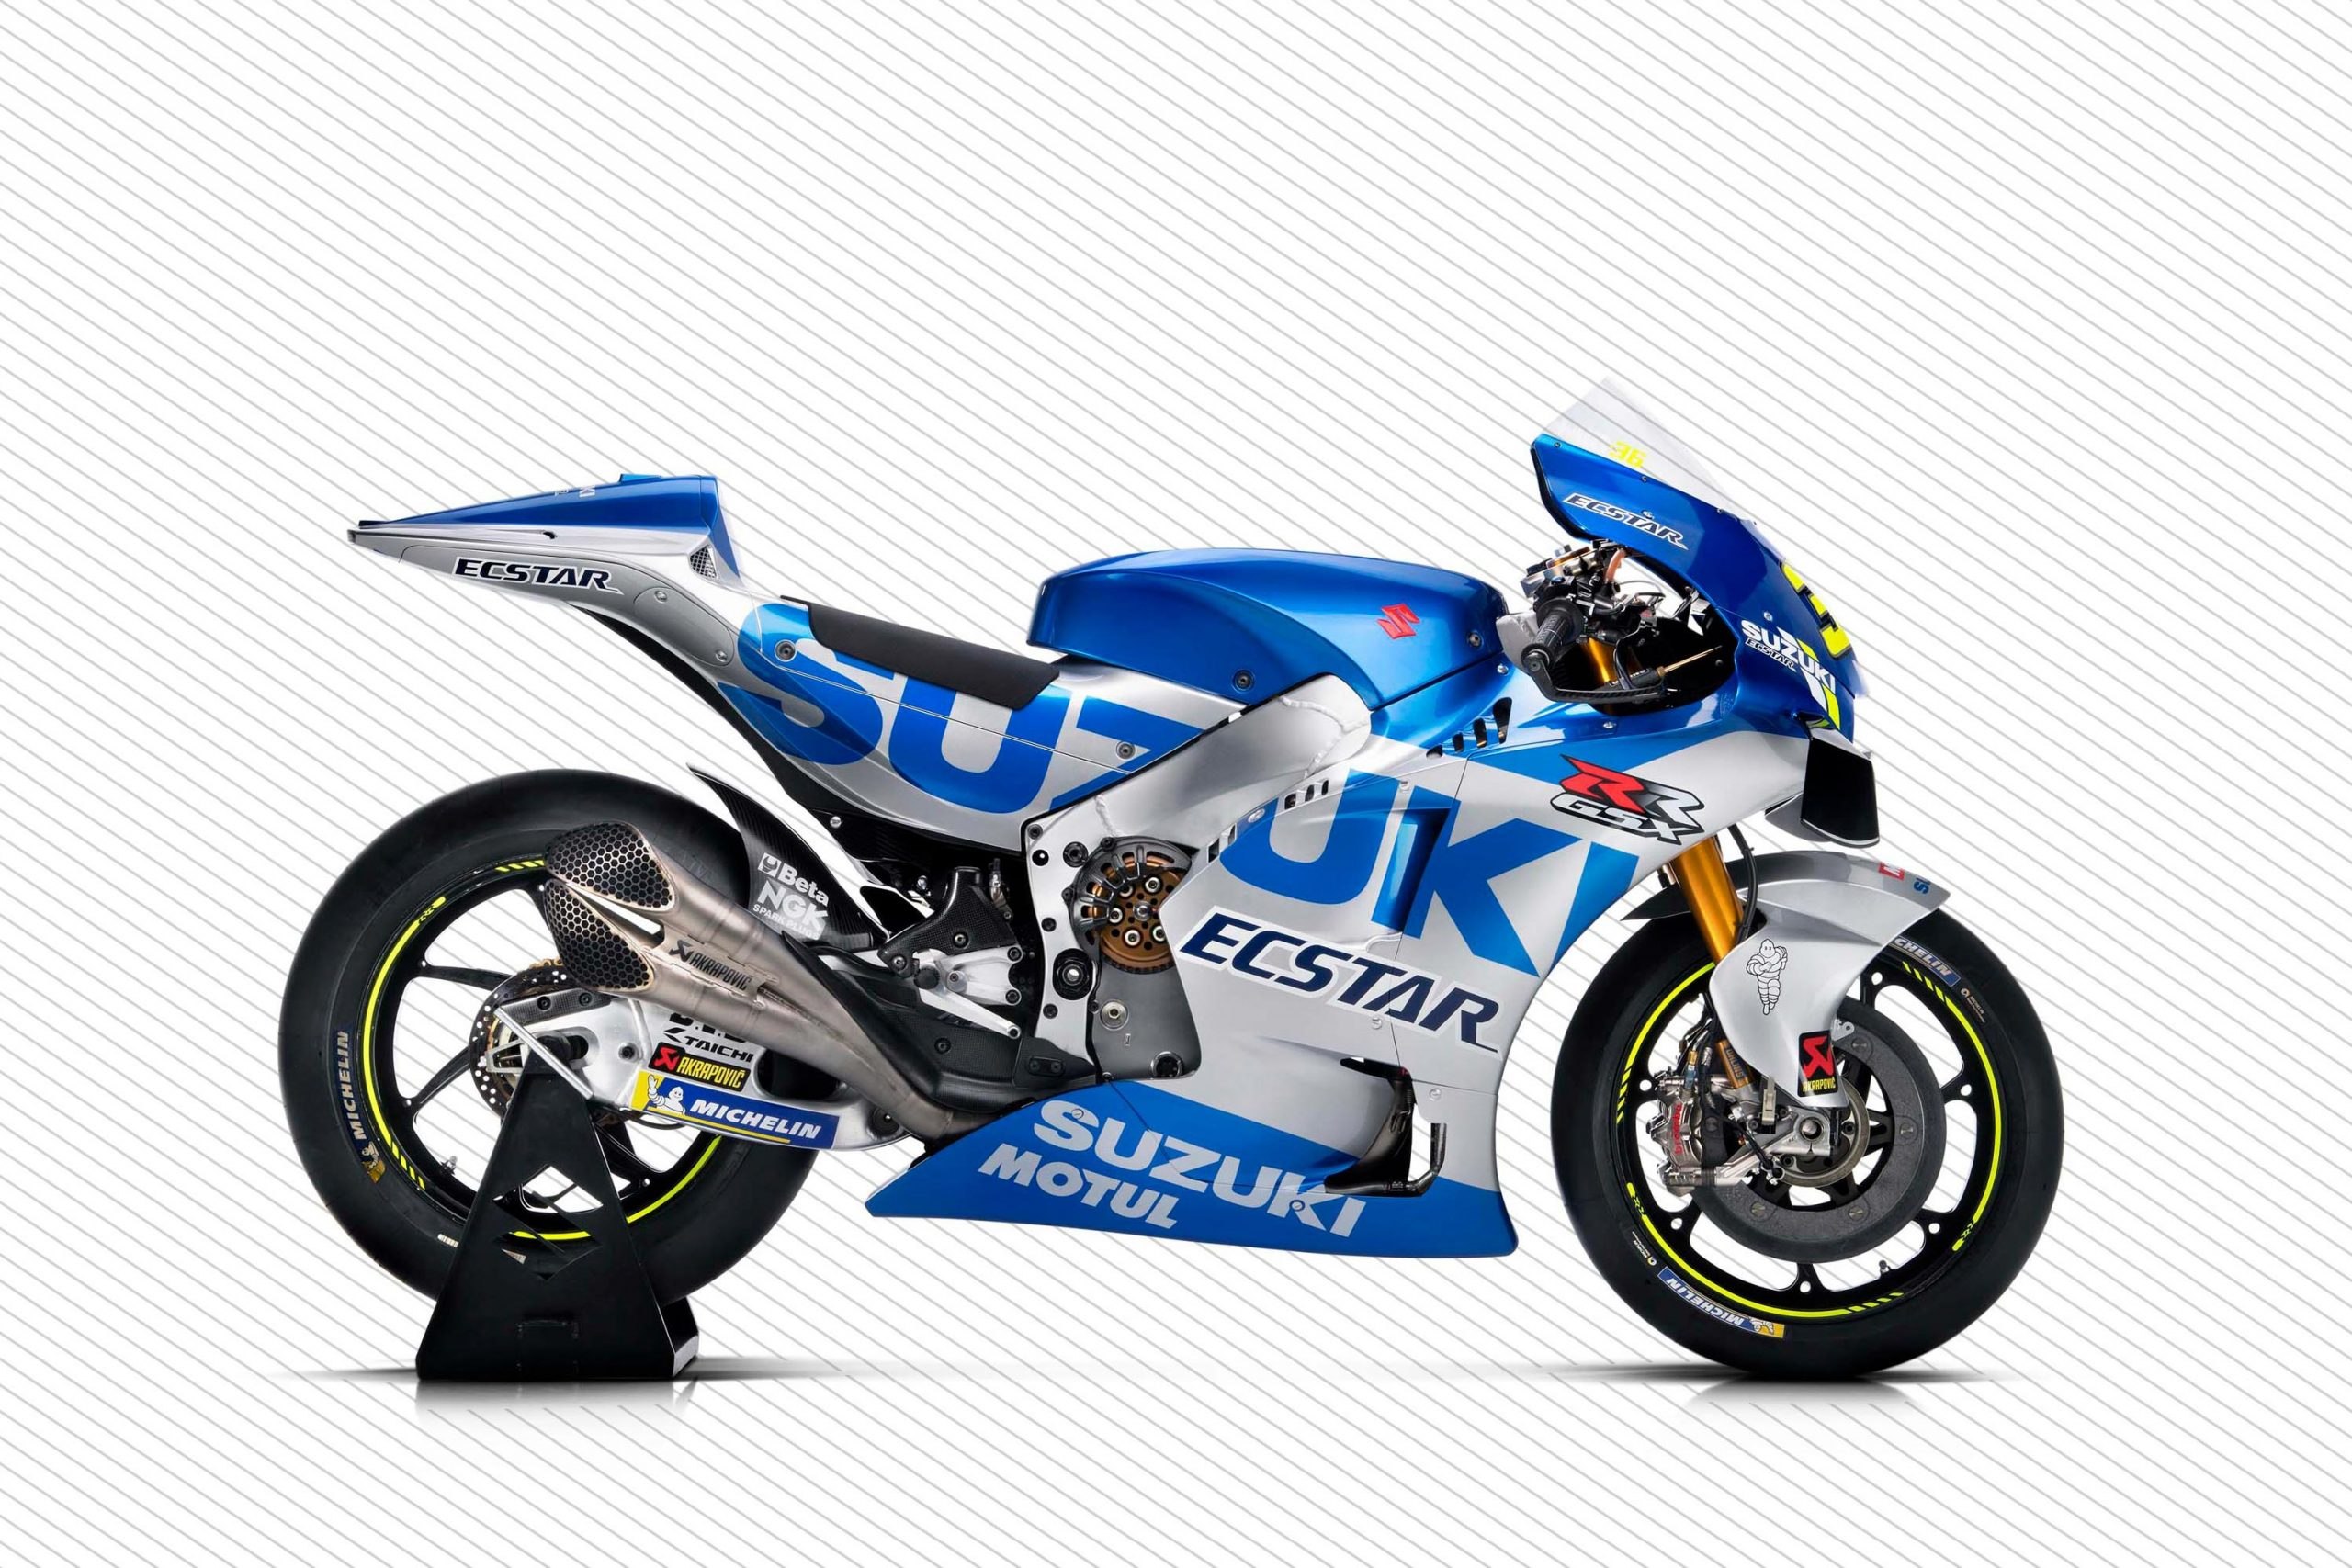 Suzuki Gsx Rr Motogp Race Bike Gets Bold New Graphics For 2020 Asphalt Rubber